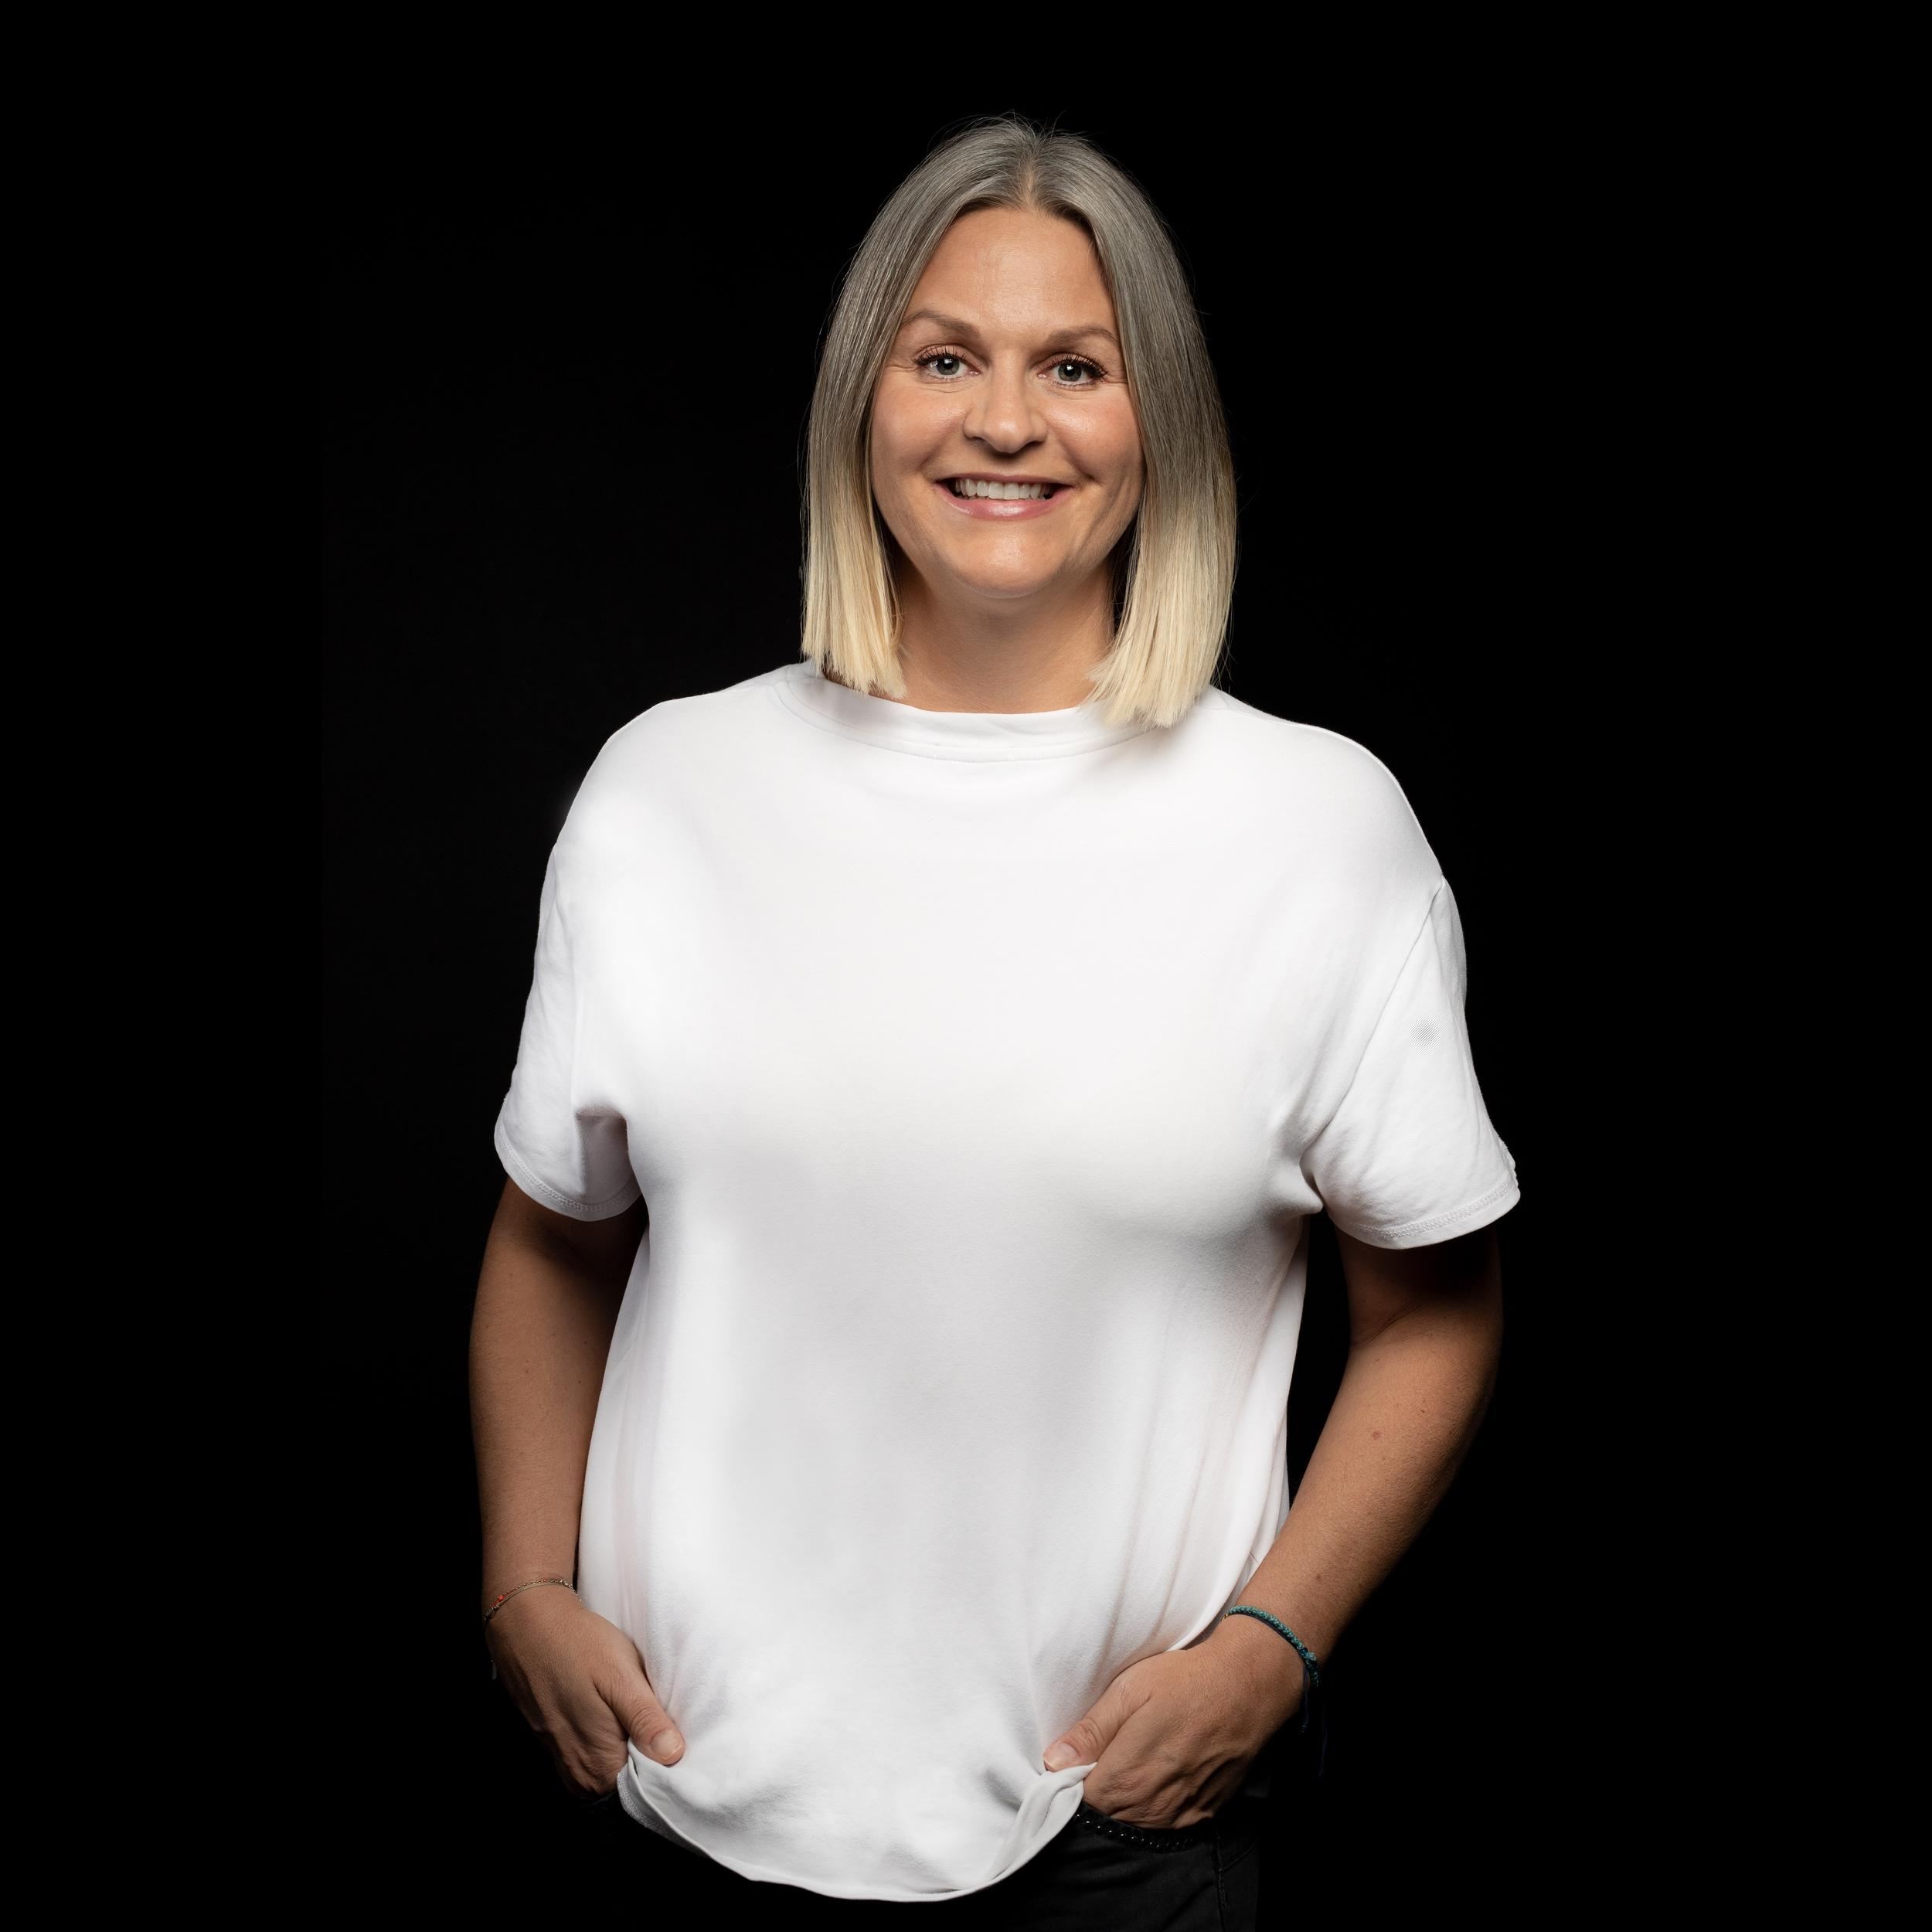 IrisDakis - Founding Partner &Head of Operations